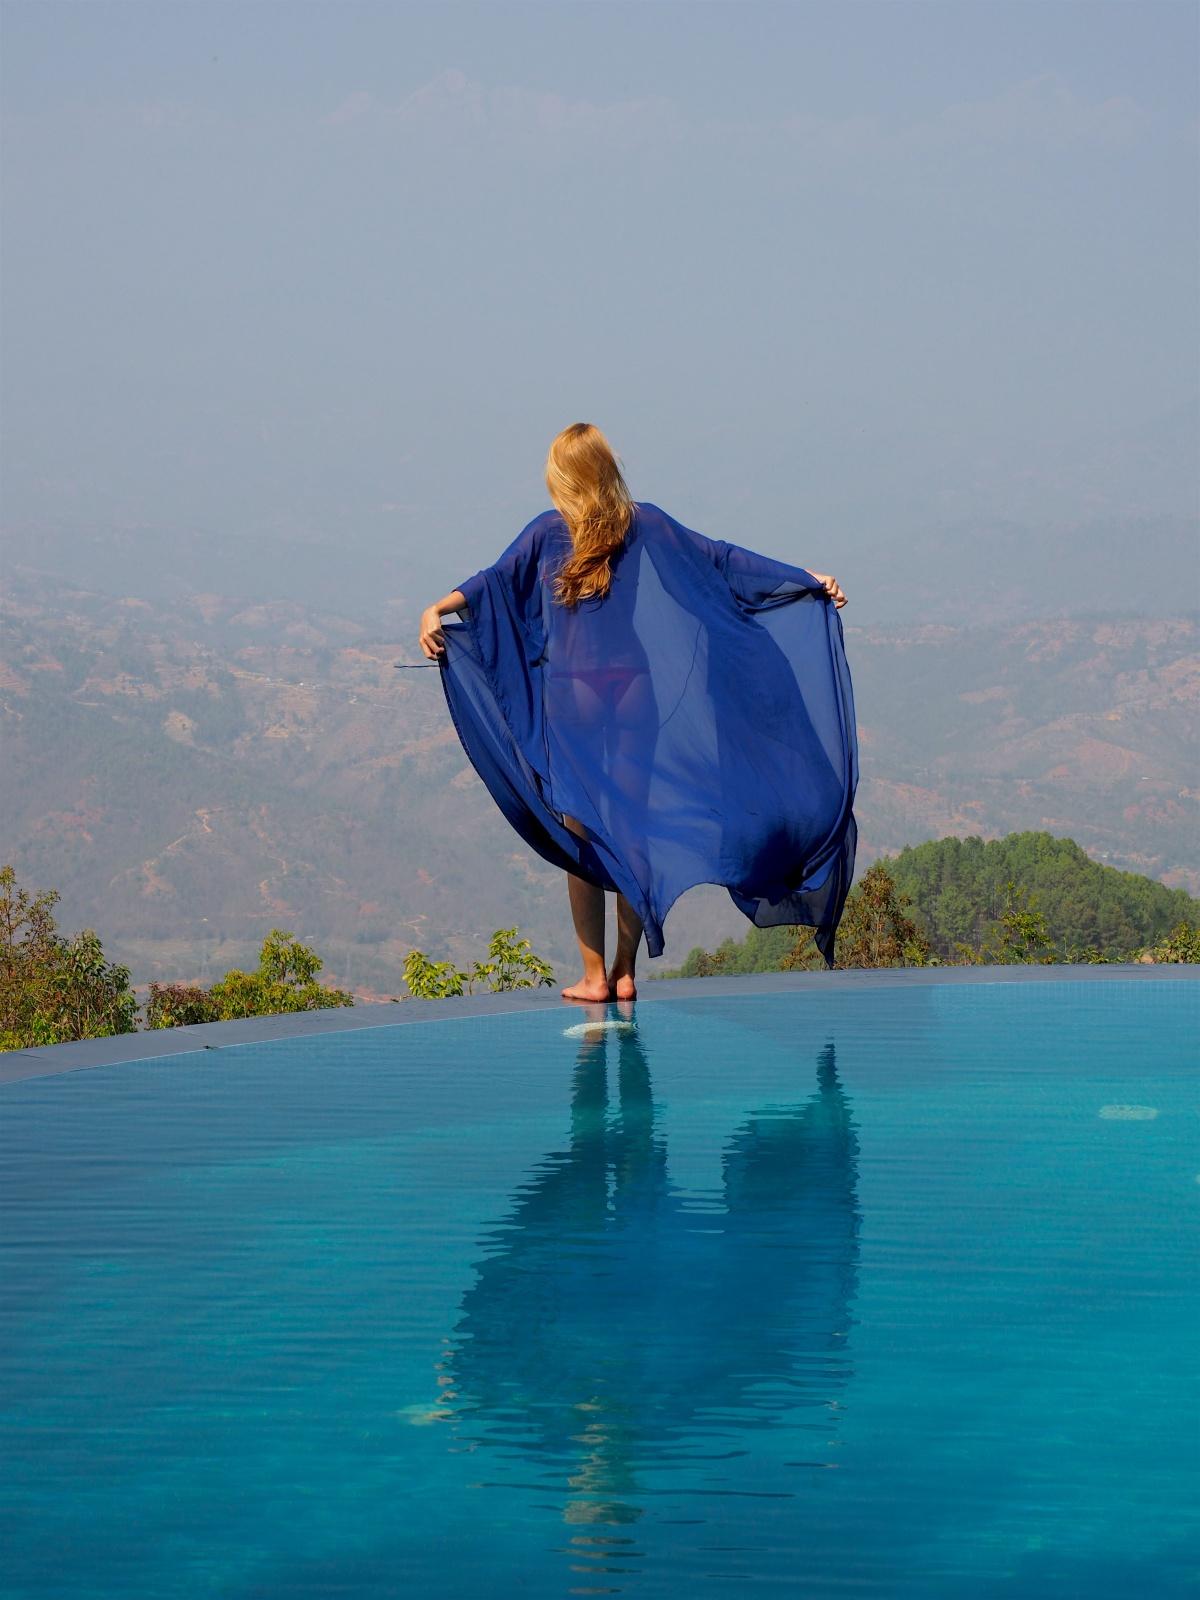 Splash in nature @Dwarika's